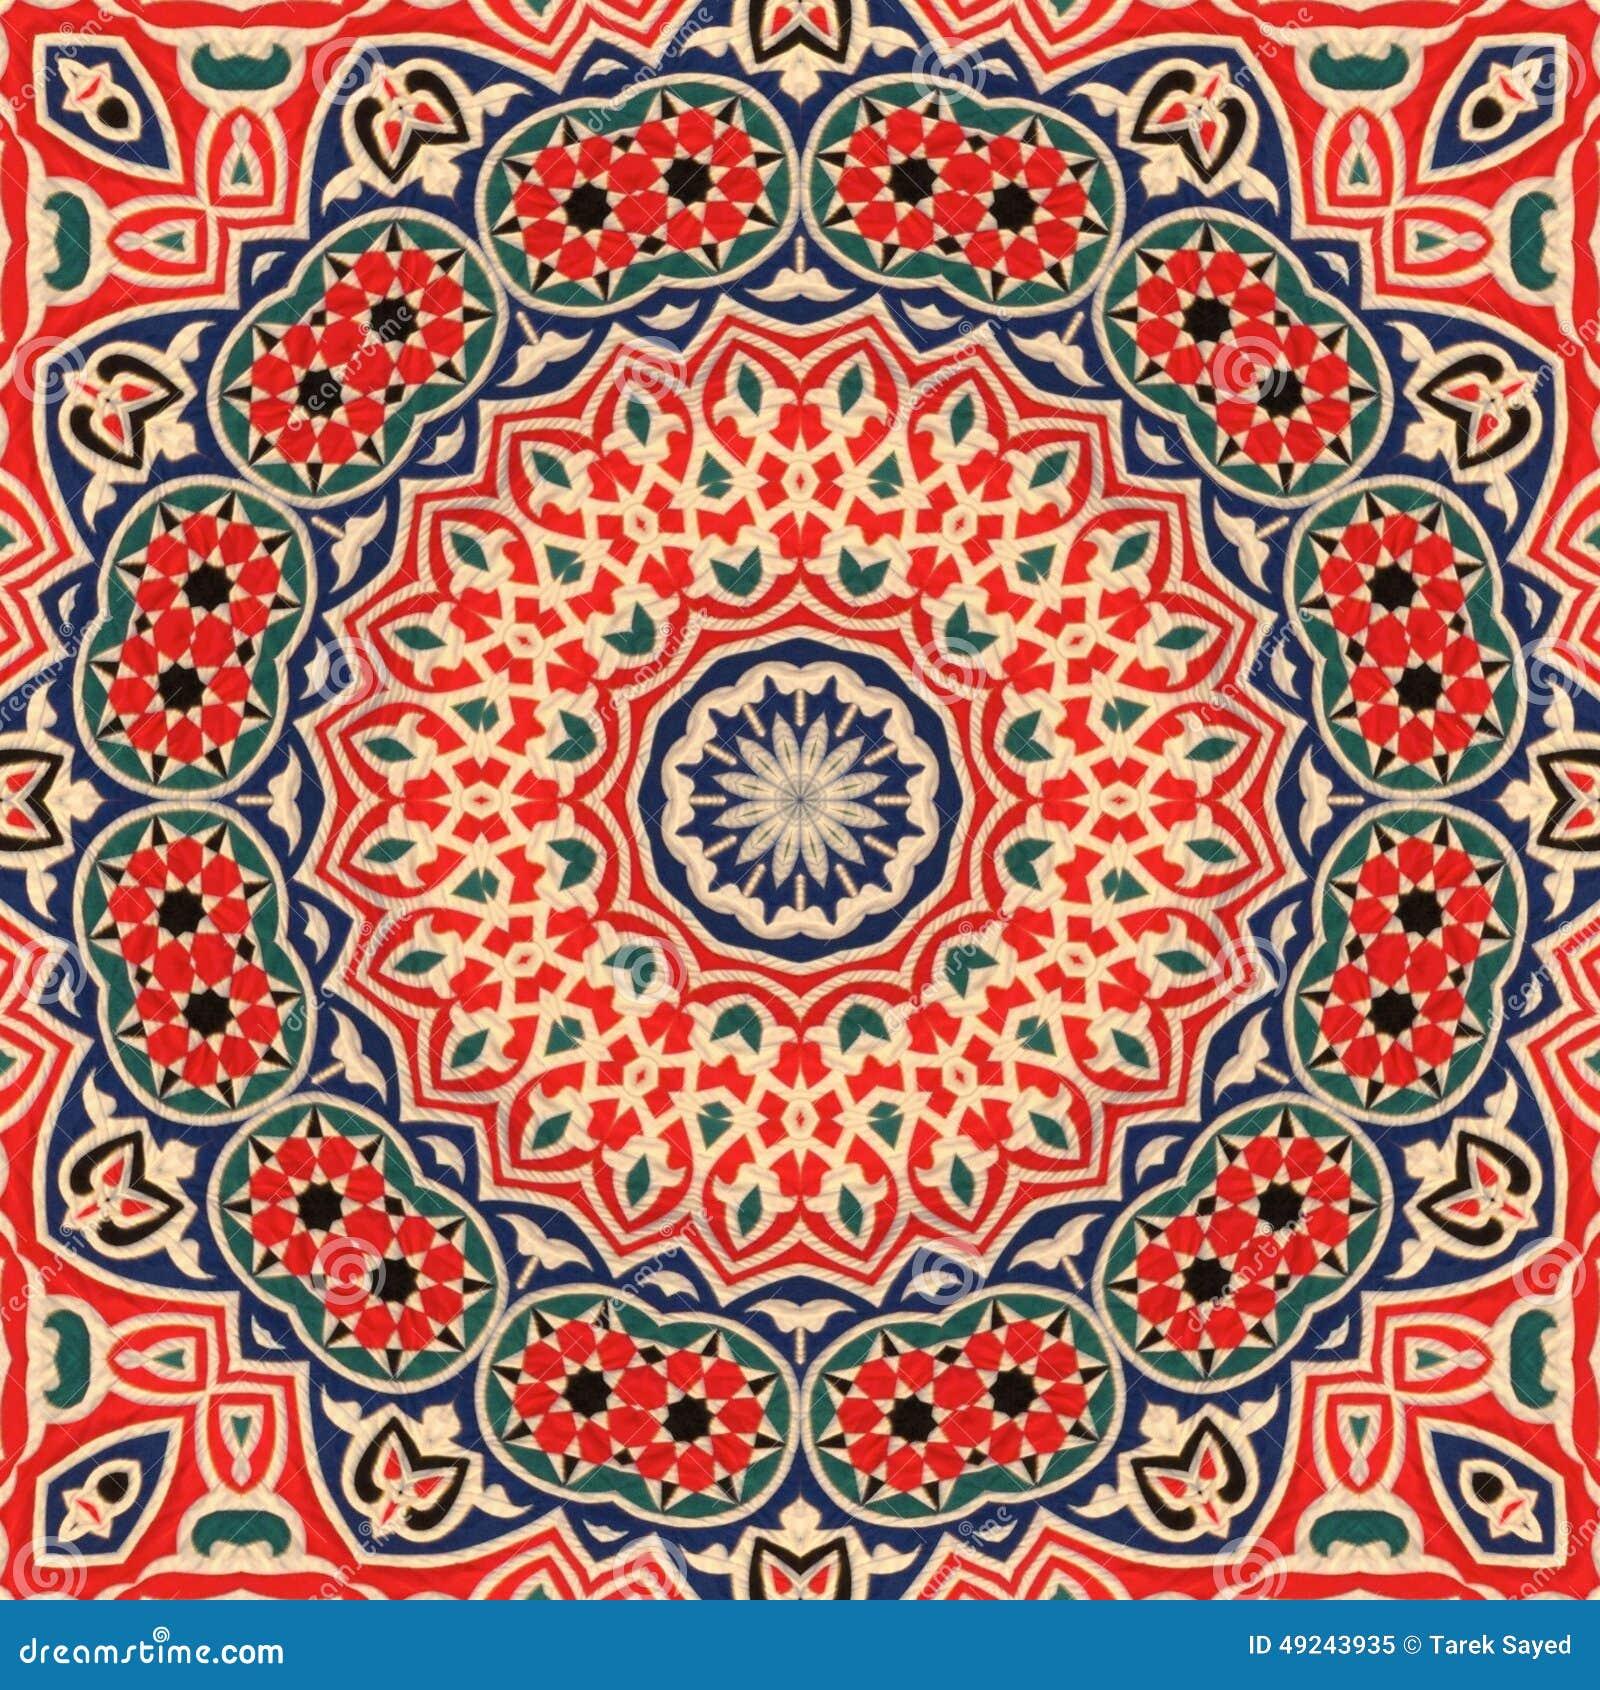 Seamless Khayameya Pattern Design 003 Stock Photo - Image: 49243935 Easy Arabesque Art